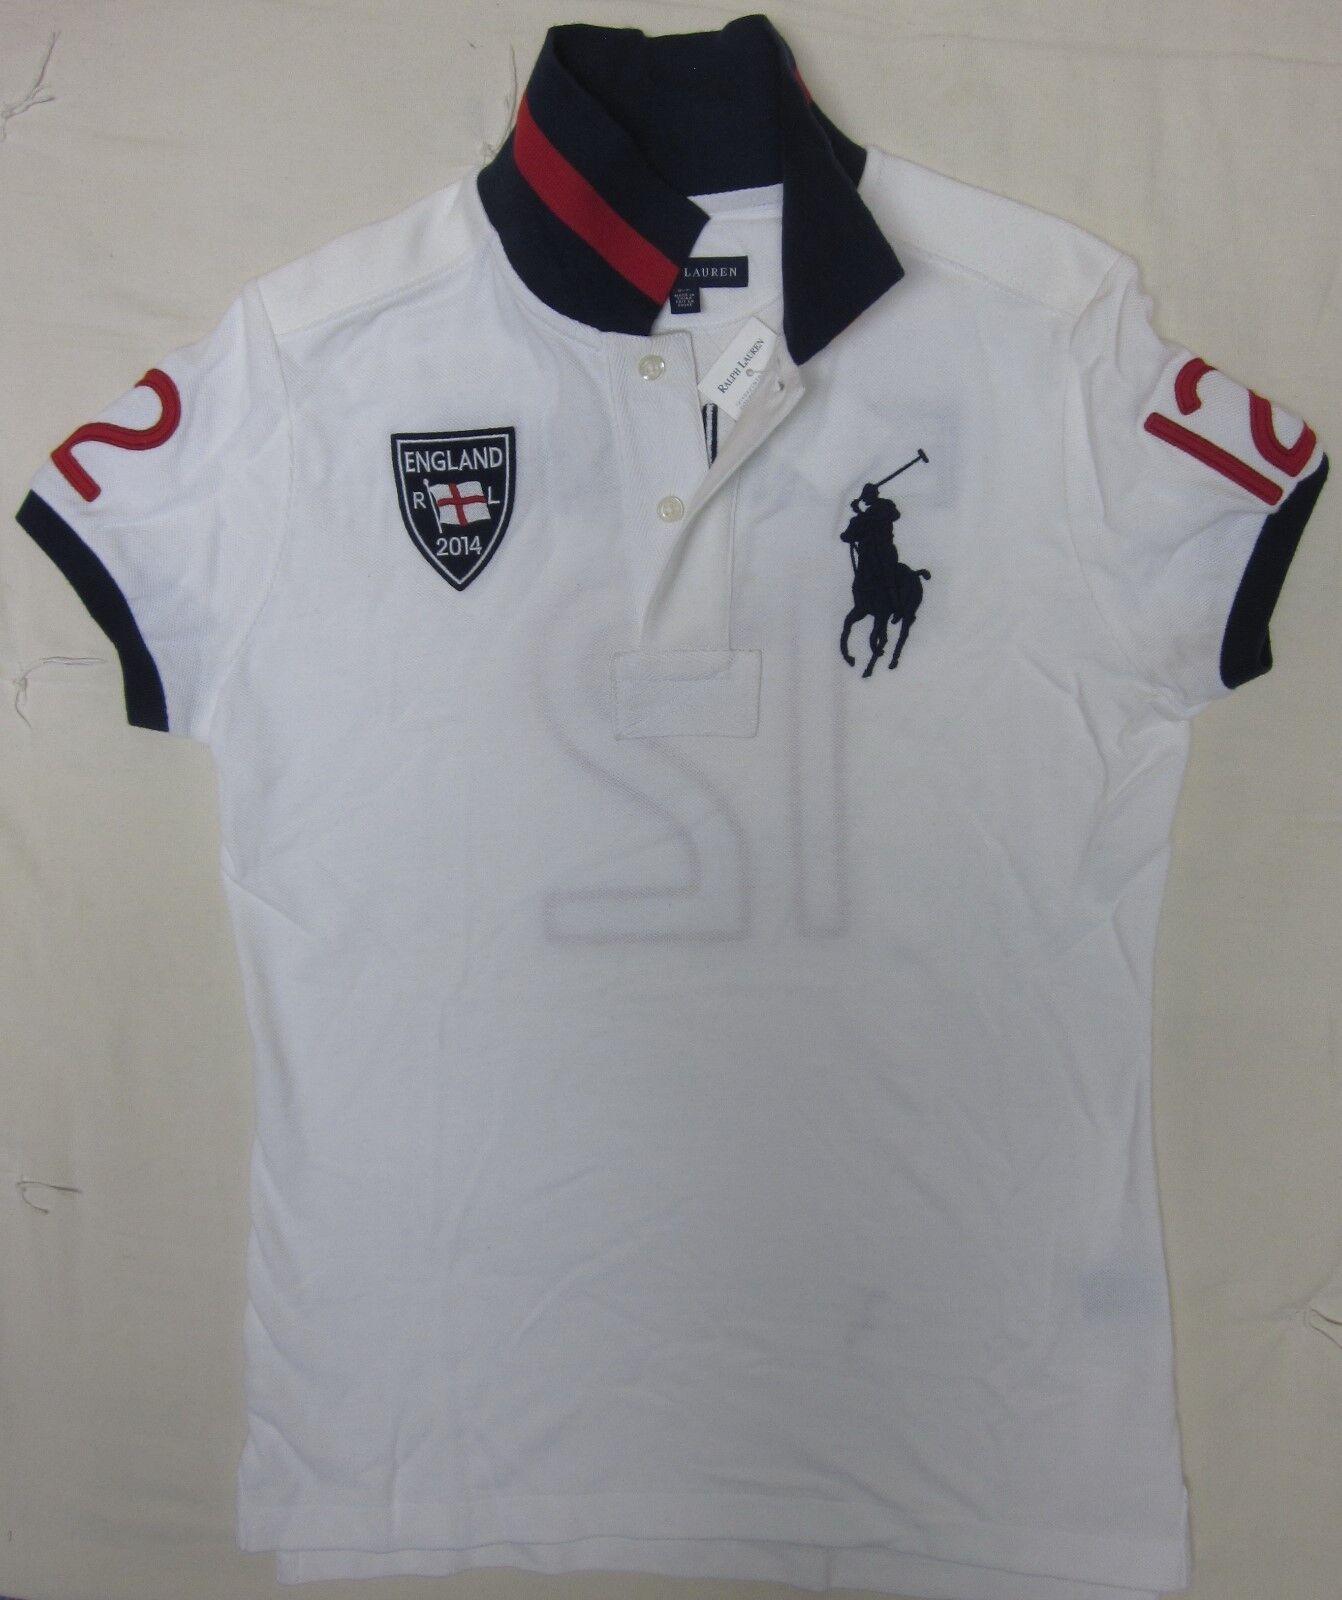 Polo Ralph Lauren England Flag Top Big Pony Mesh Shirt Tennis